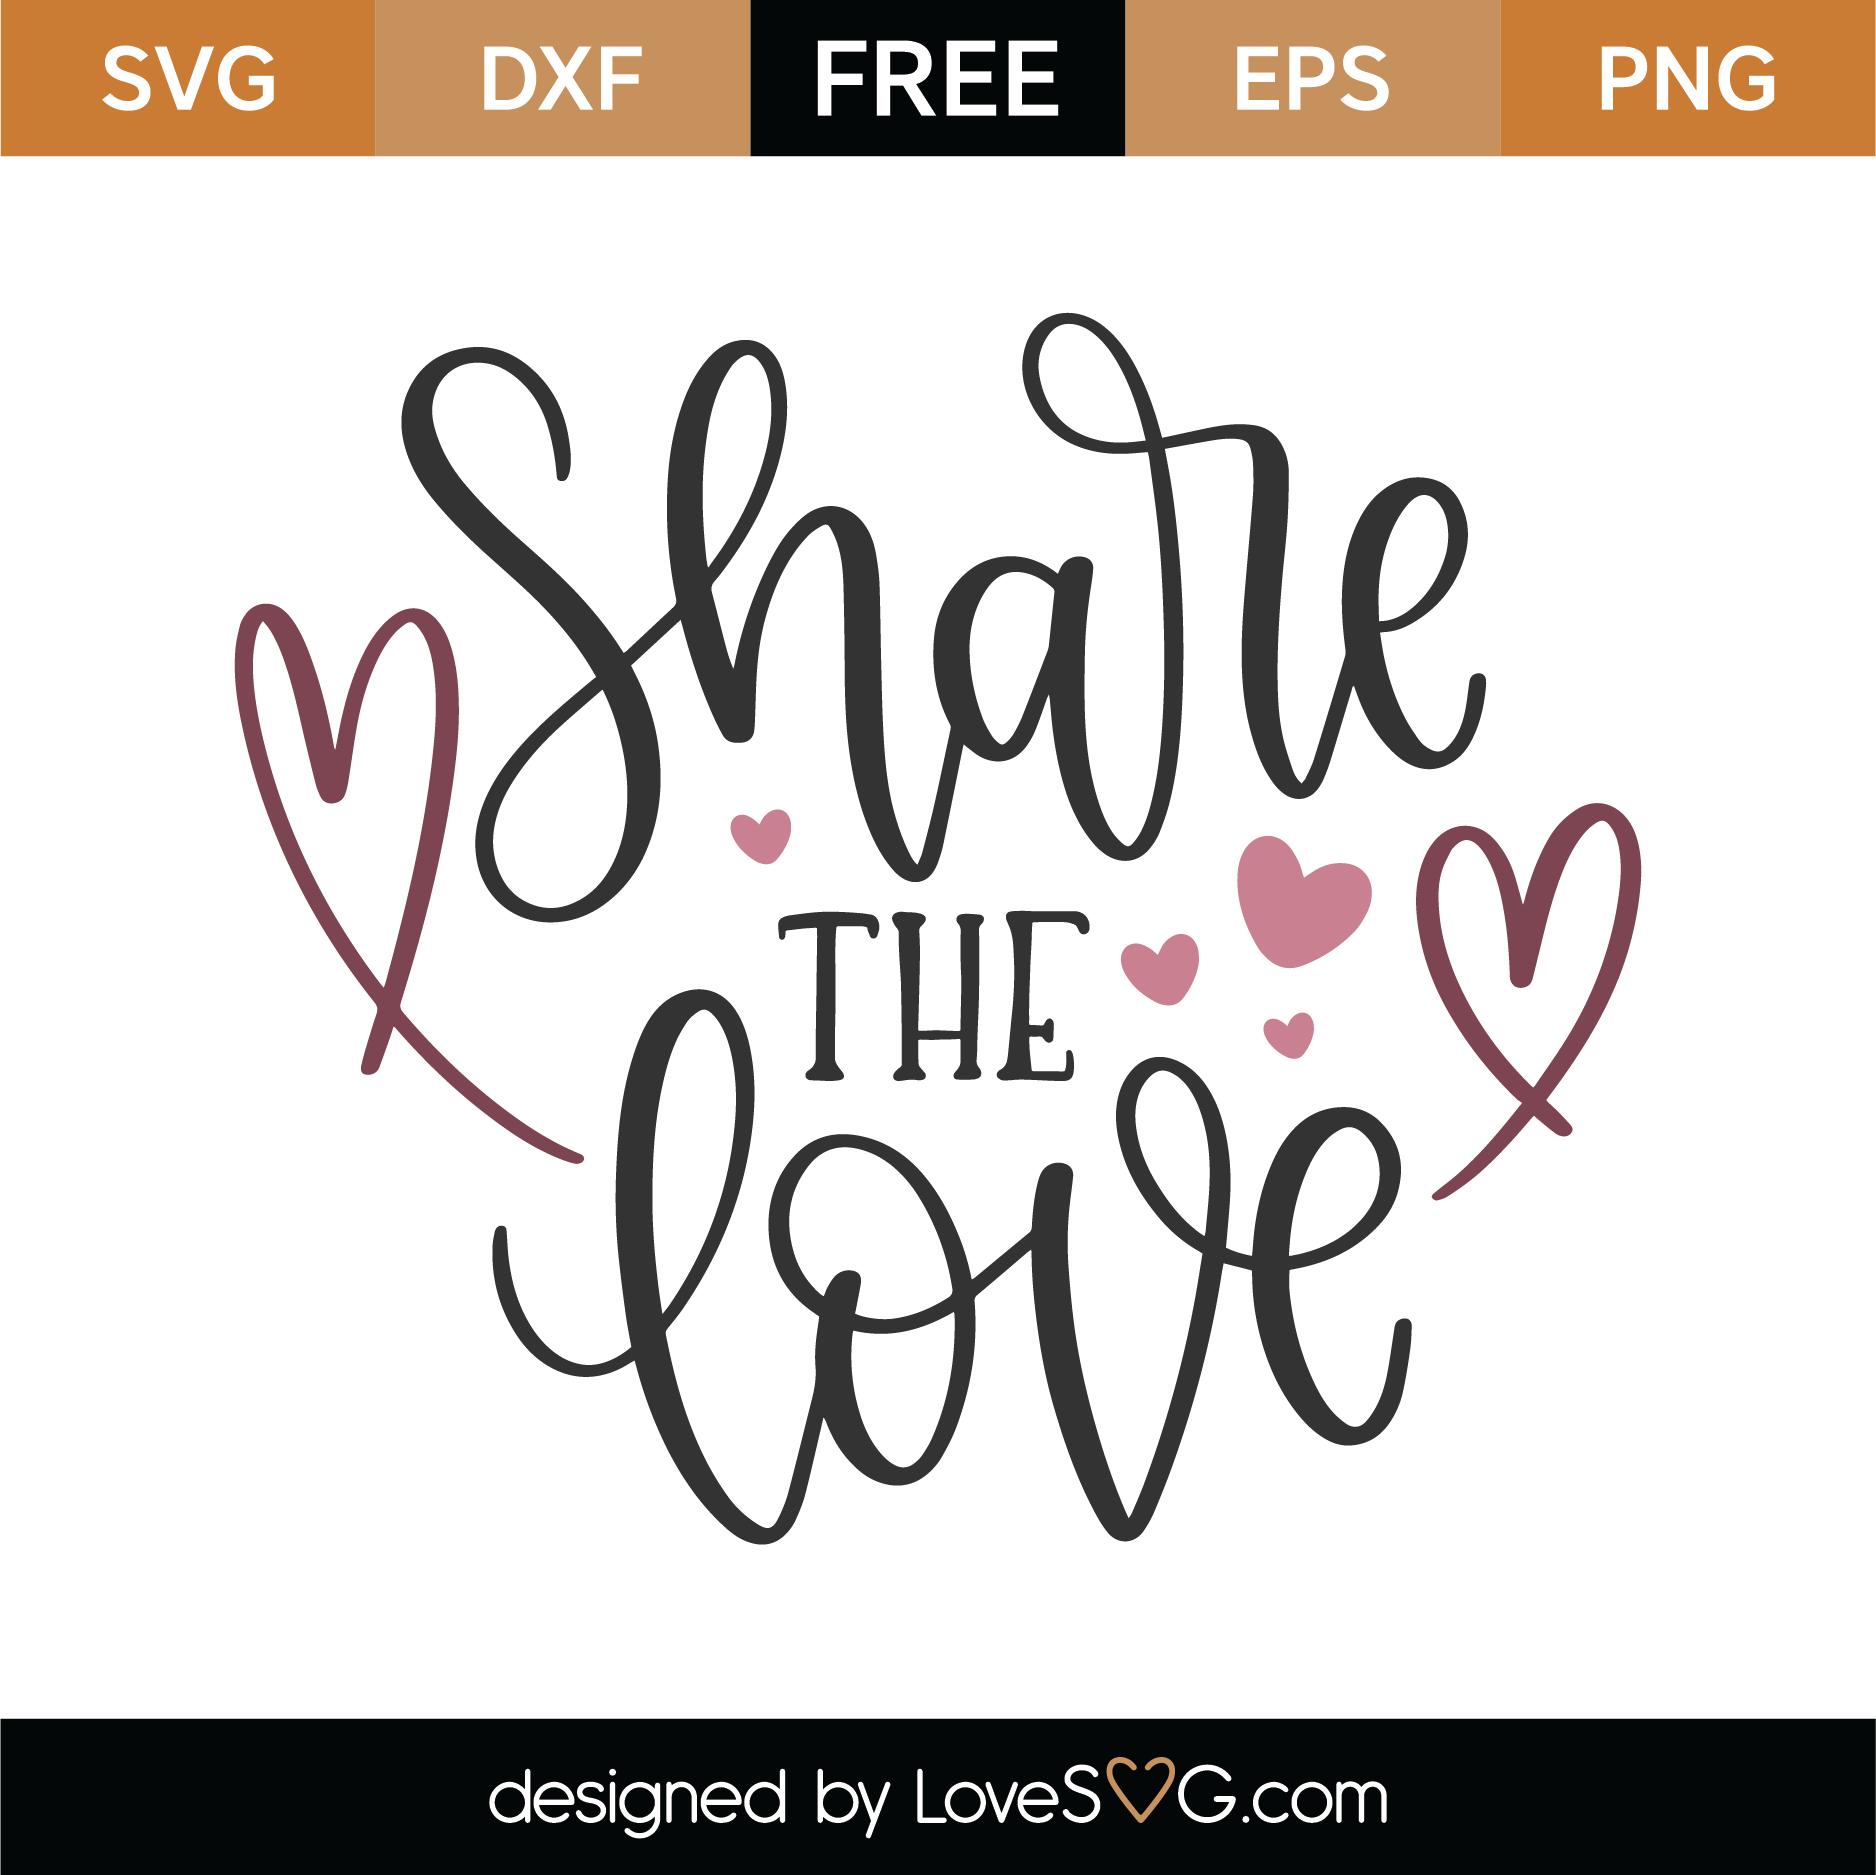 Free Share The Love SVG Cut File | Lovesvg.com